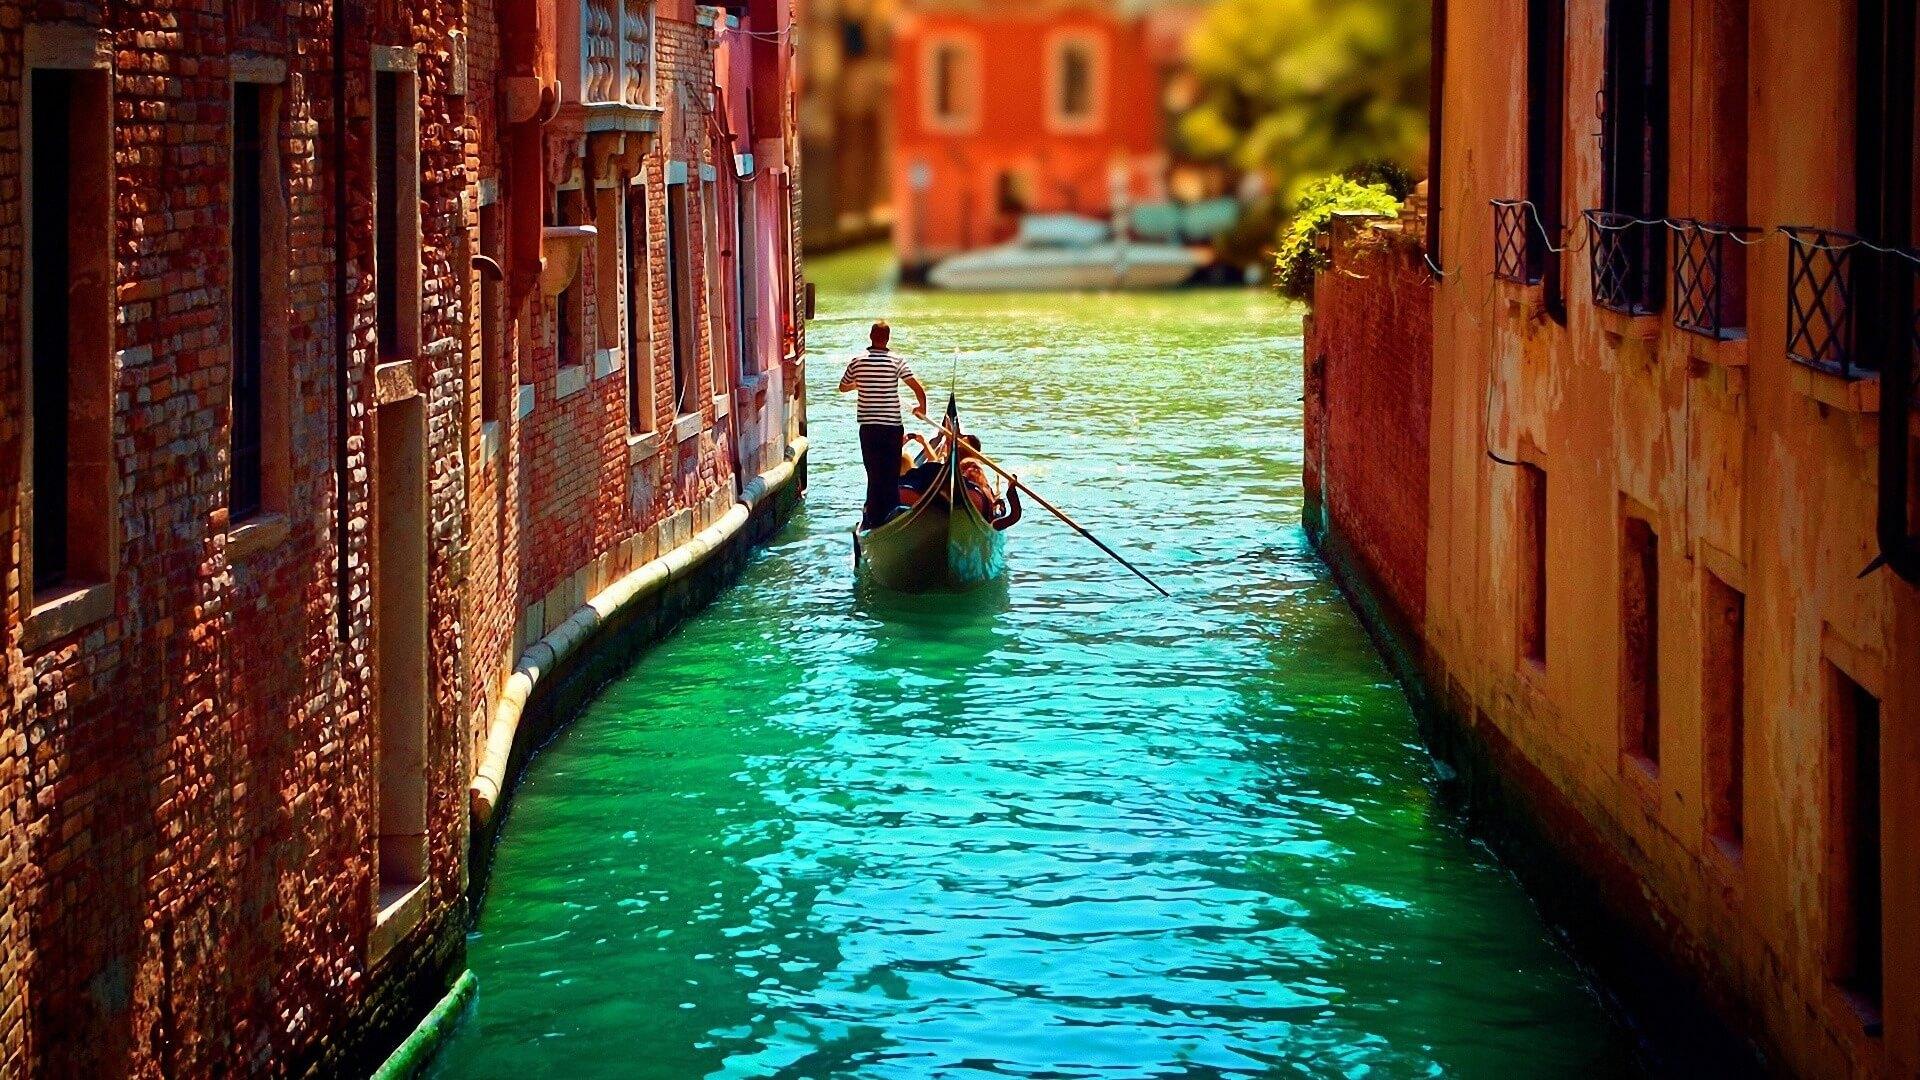 Cheap flights from Venice